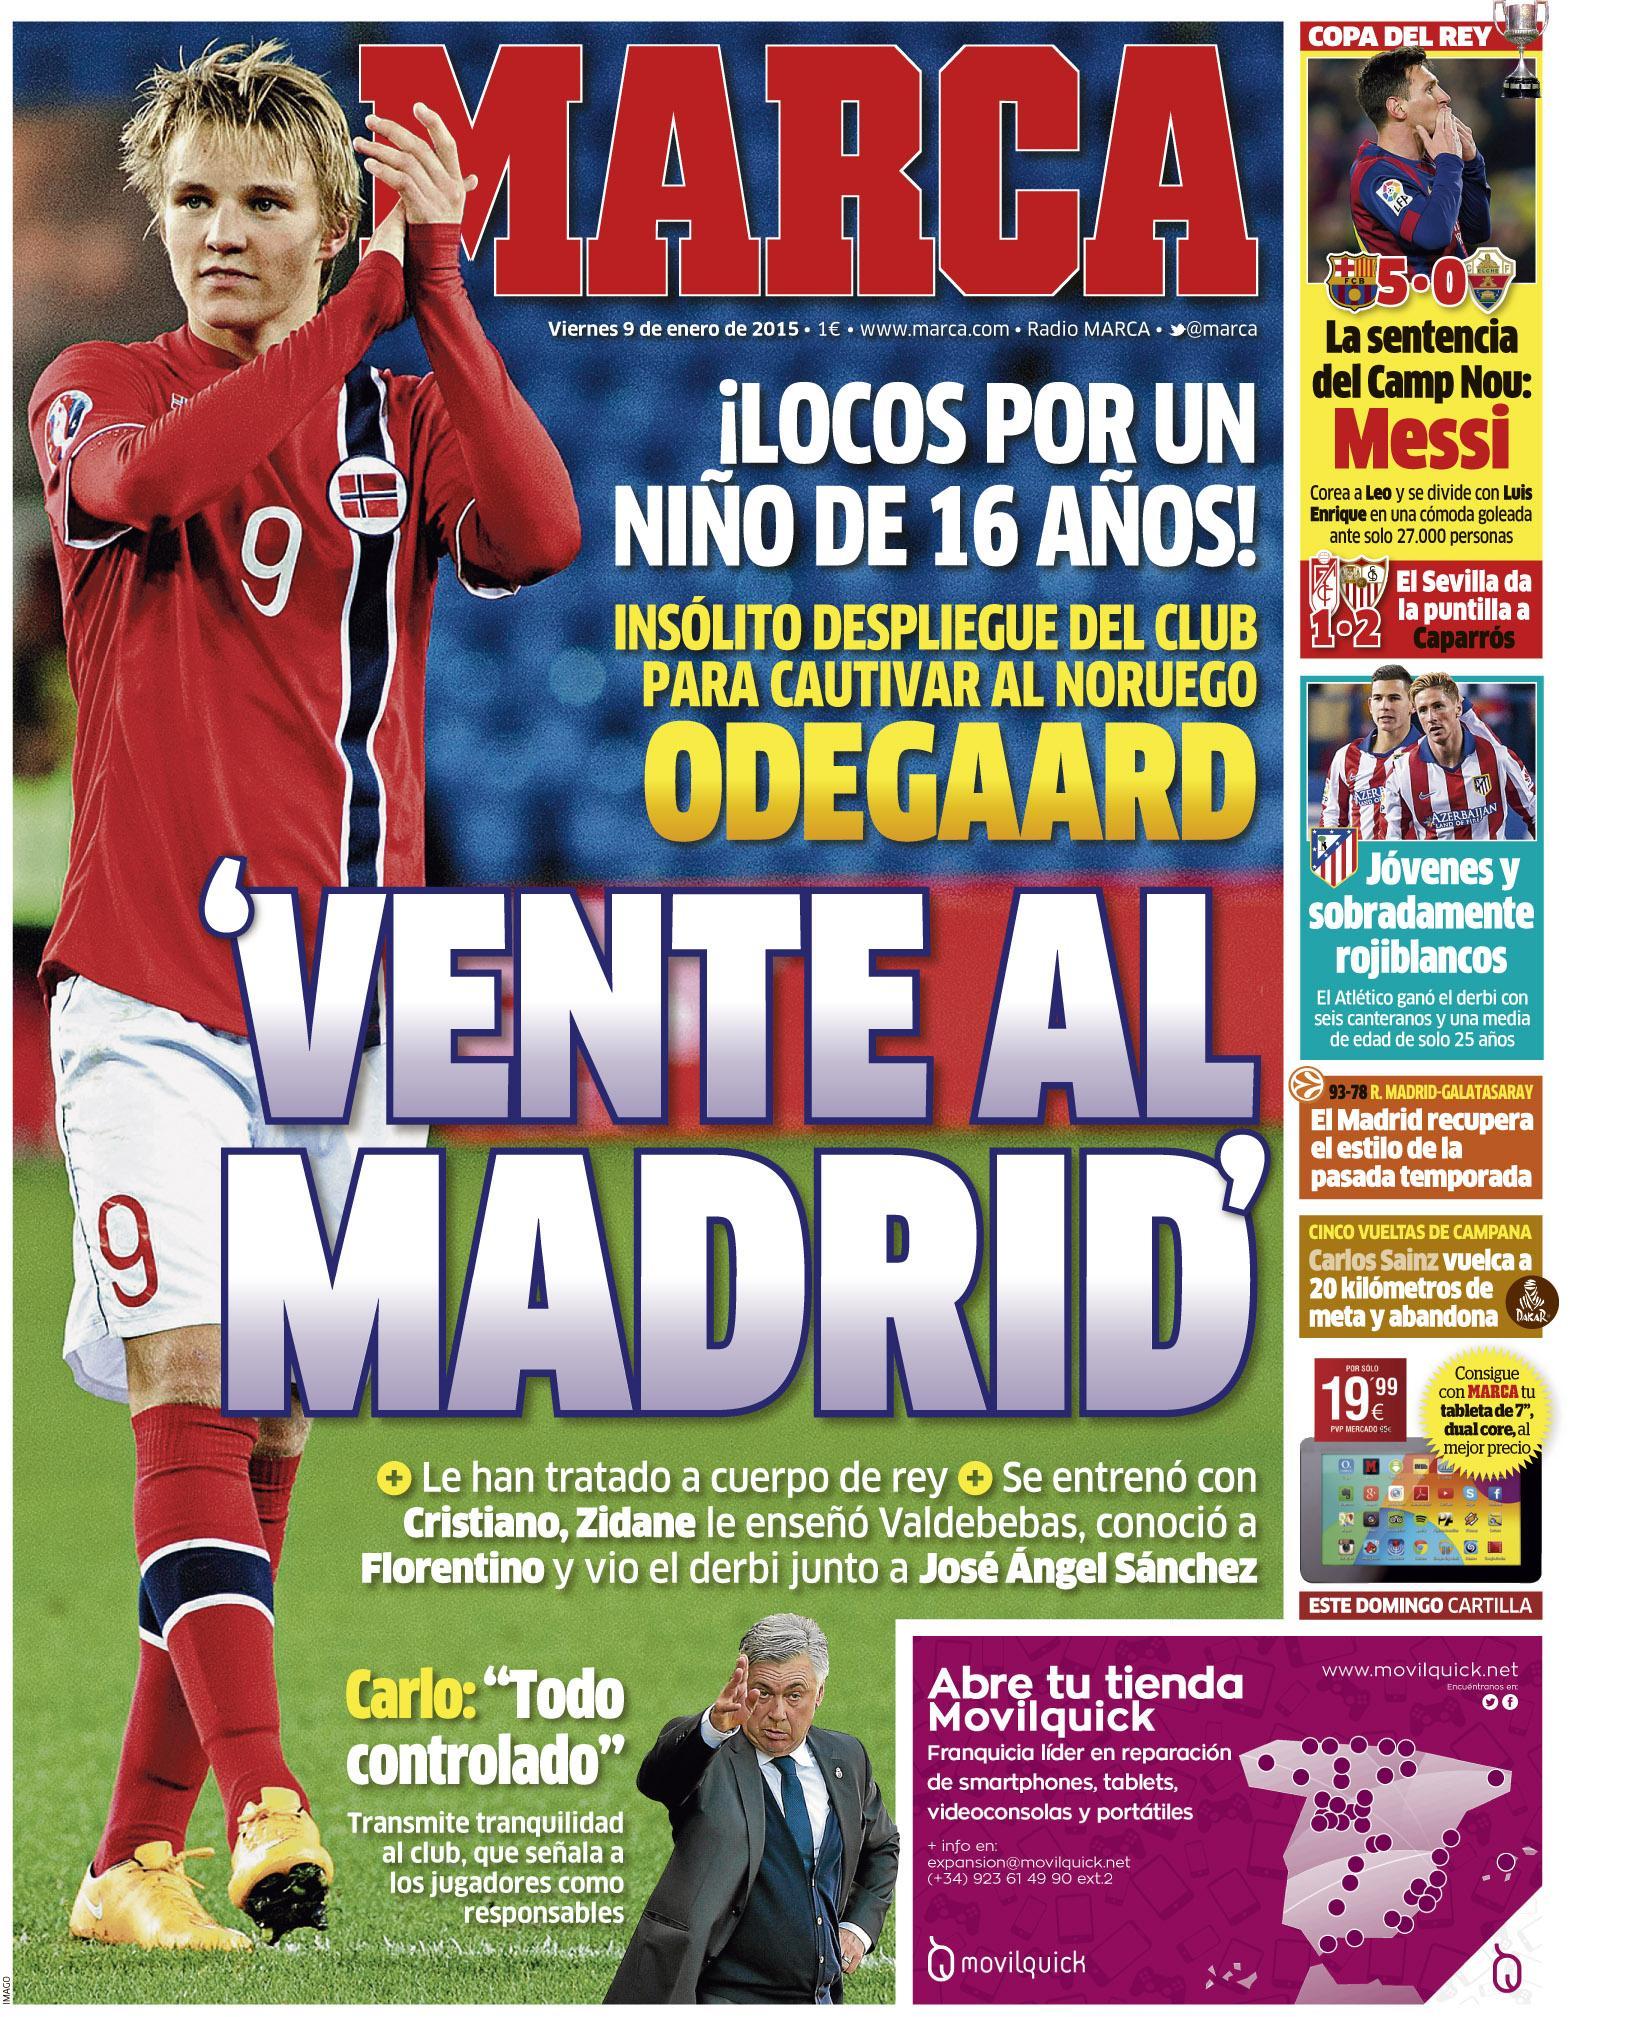 #LaPortada 'Vente al Madrid' http://t.co/4FJ6YlM3PV